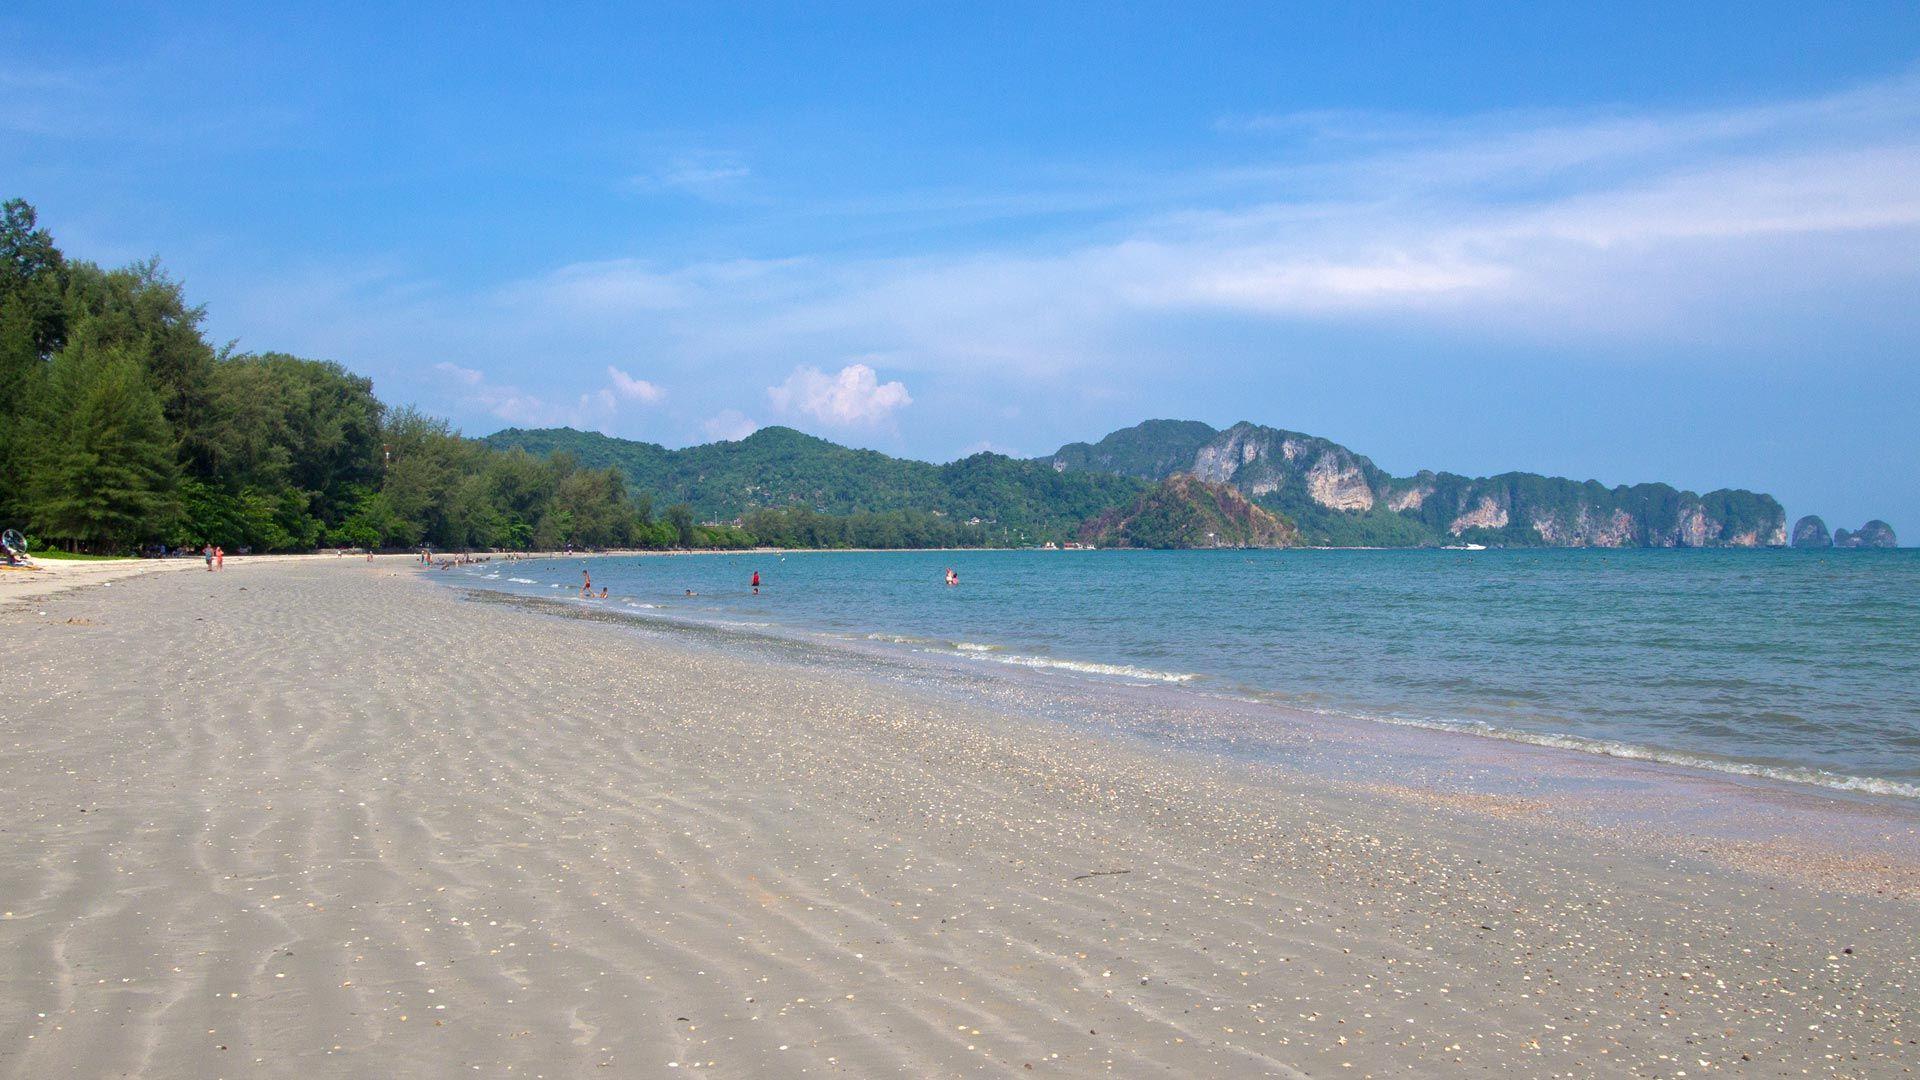 Plaża Nopparat Thara, Krabi.